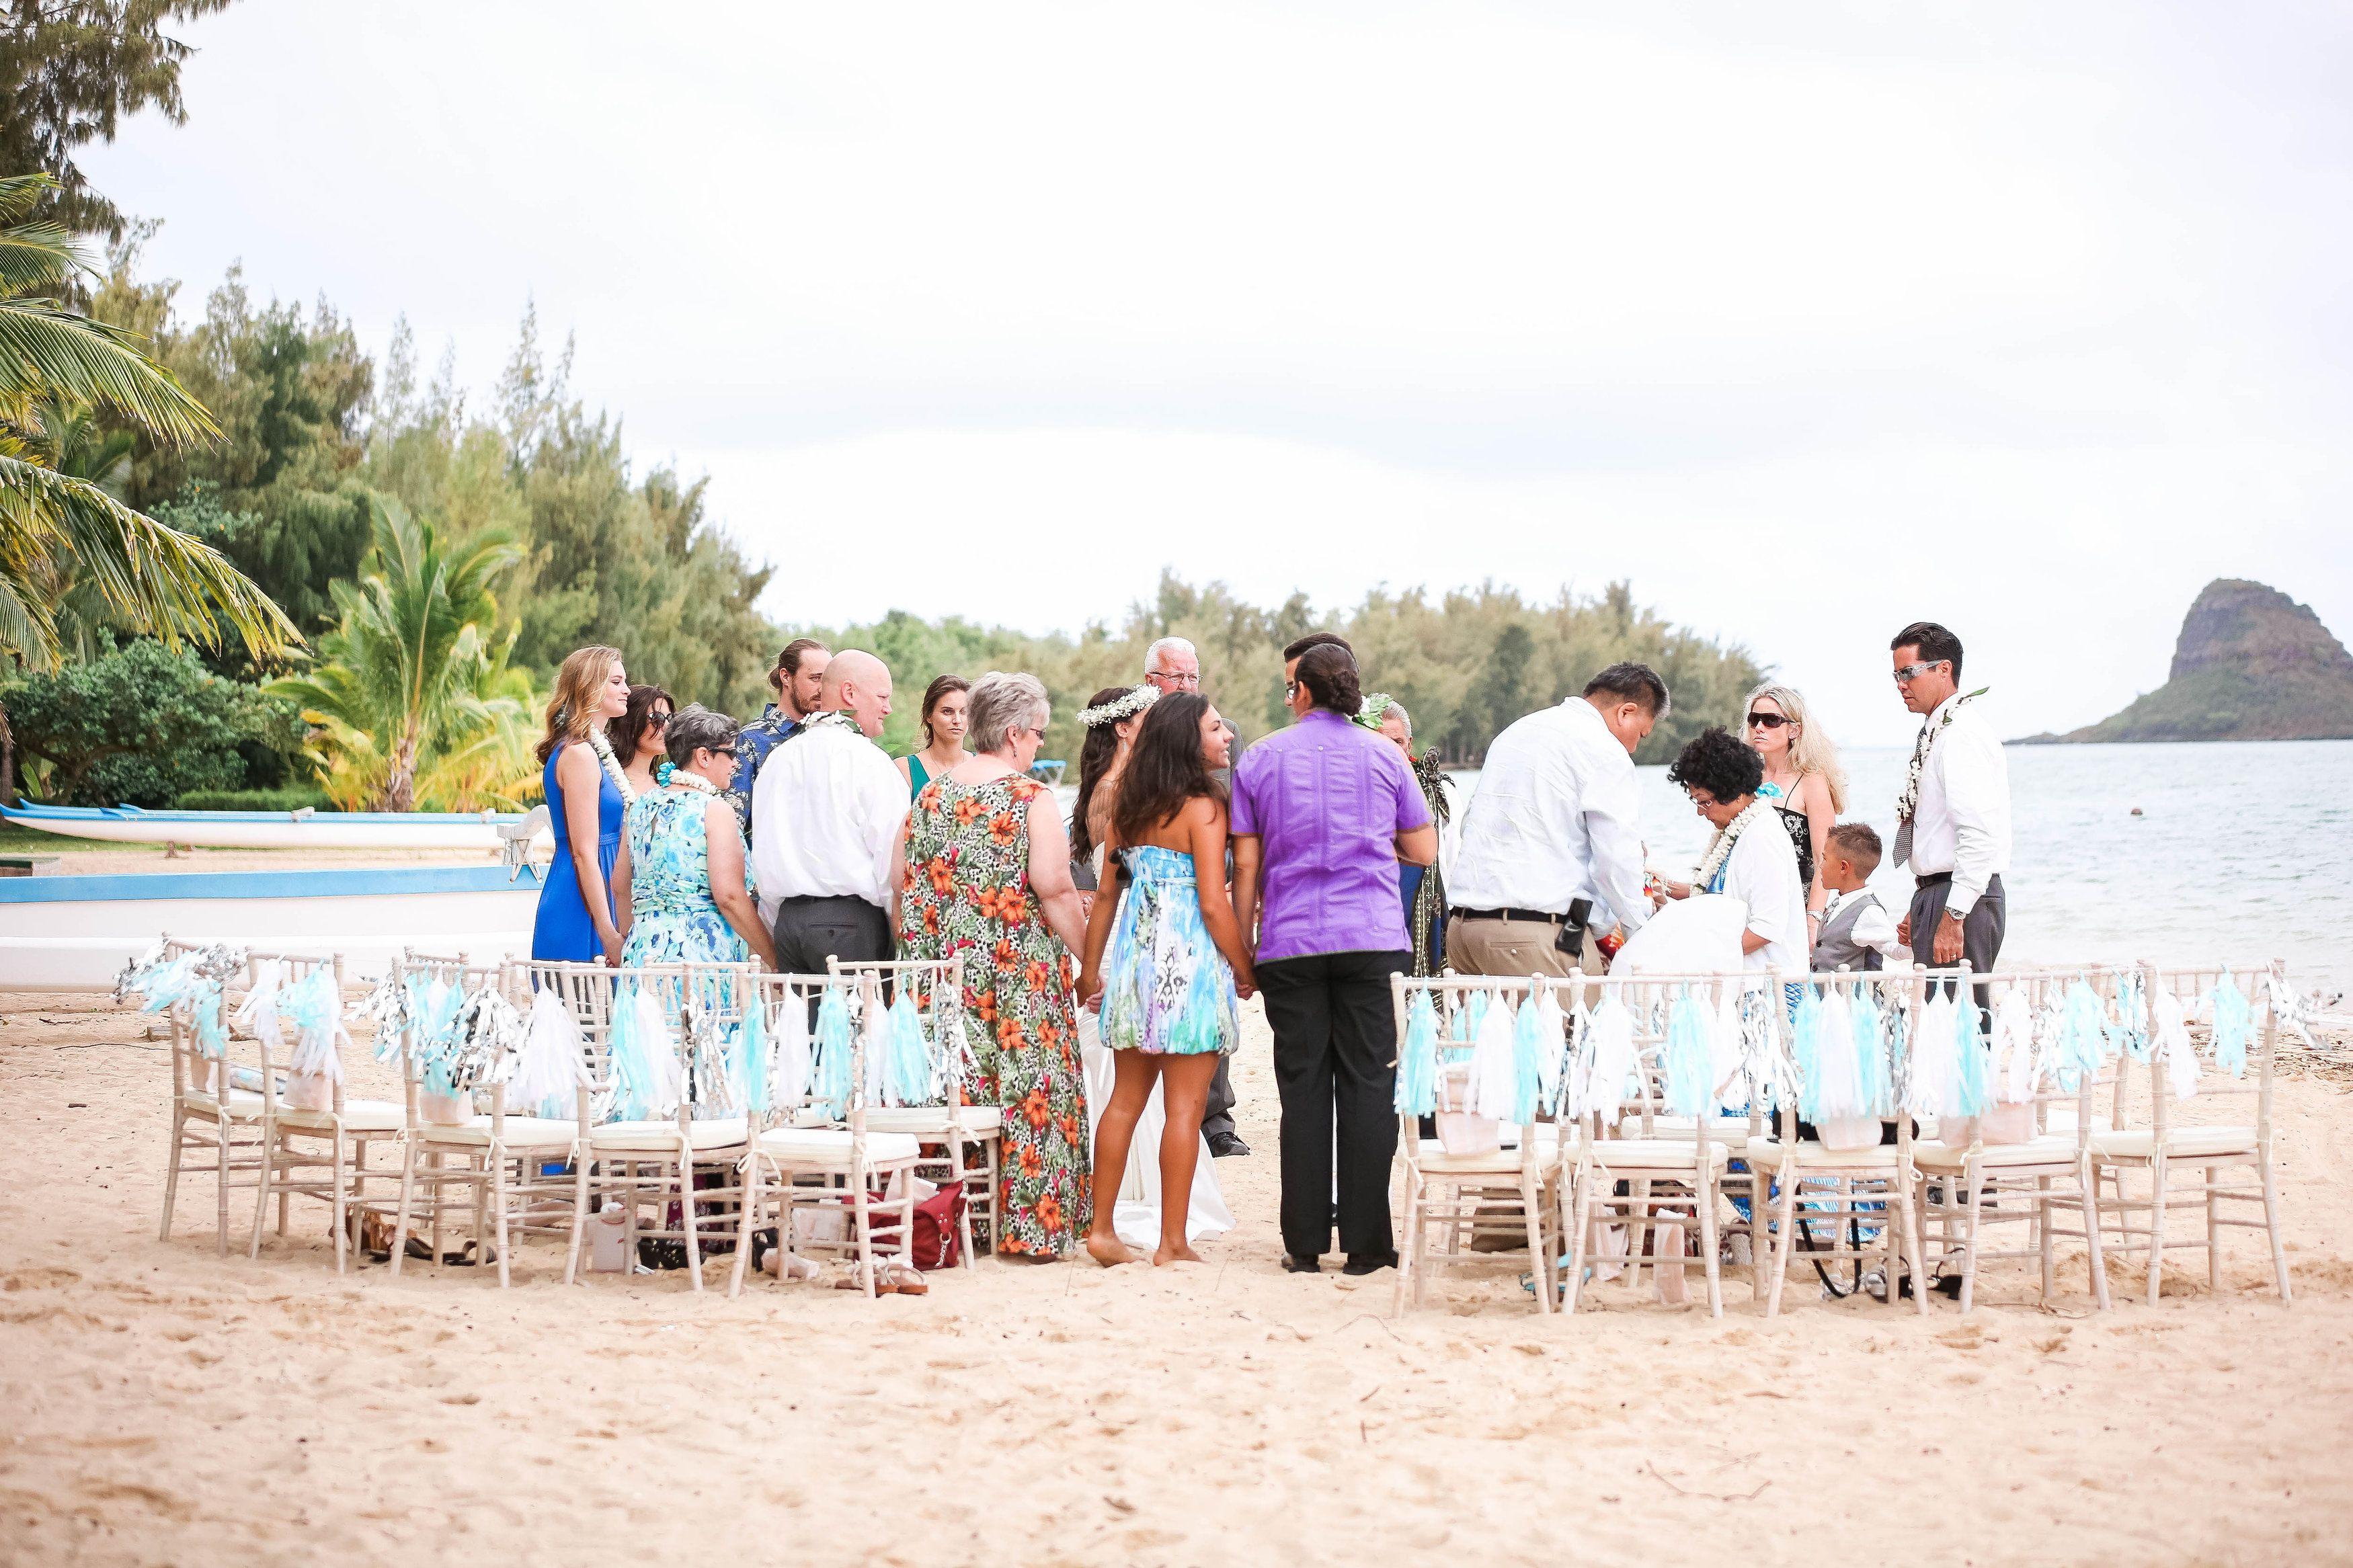 Sedie chiavarine ~ Whitewash chiavari chairs a beach ceremony secret island kualoa